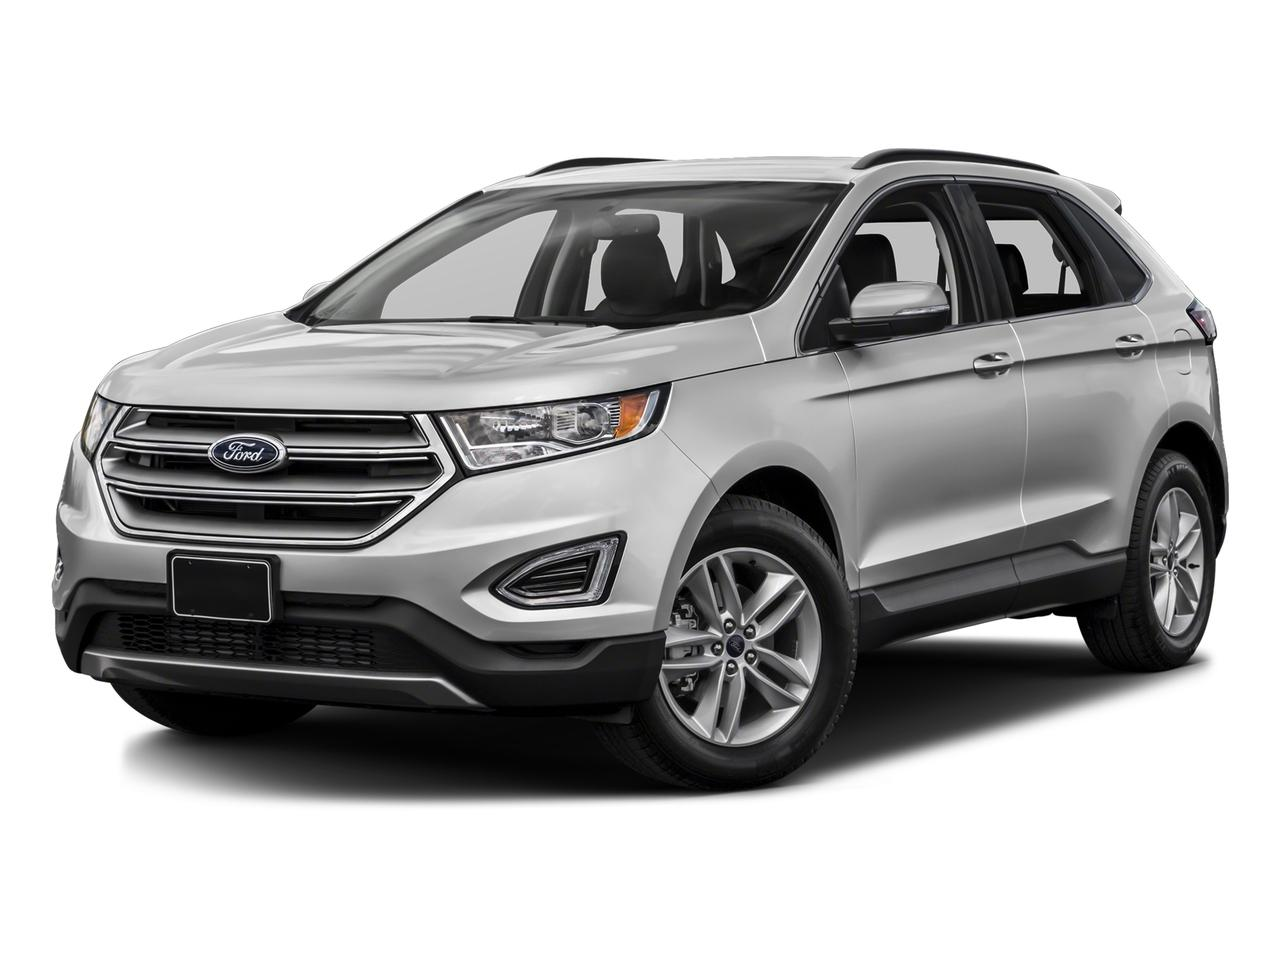 2016 Ford Edge Vehicle Photo in Redding, CA 96002